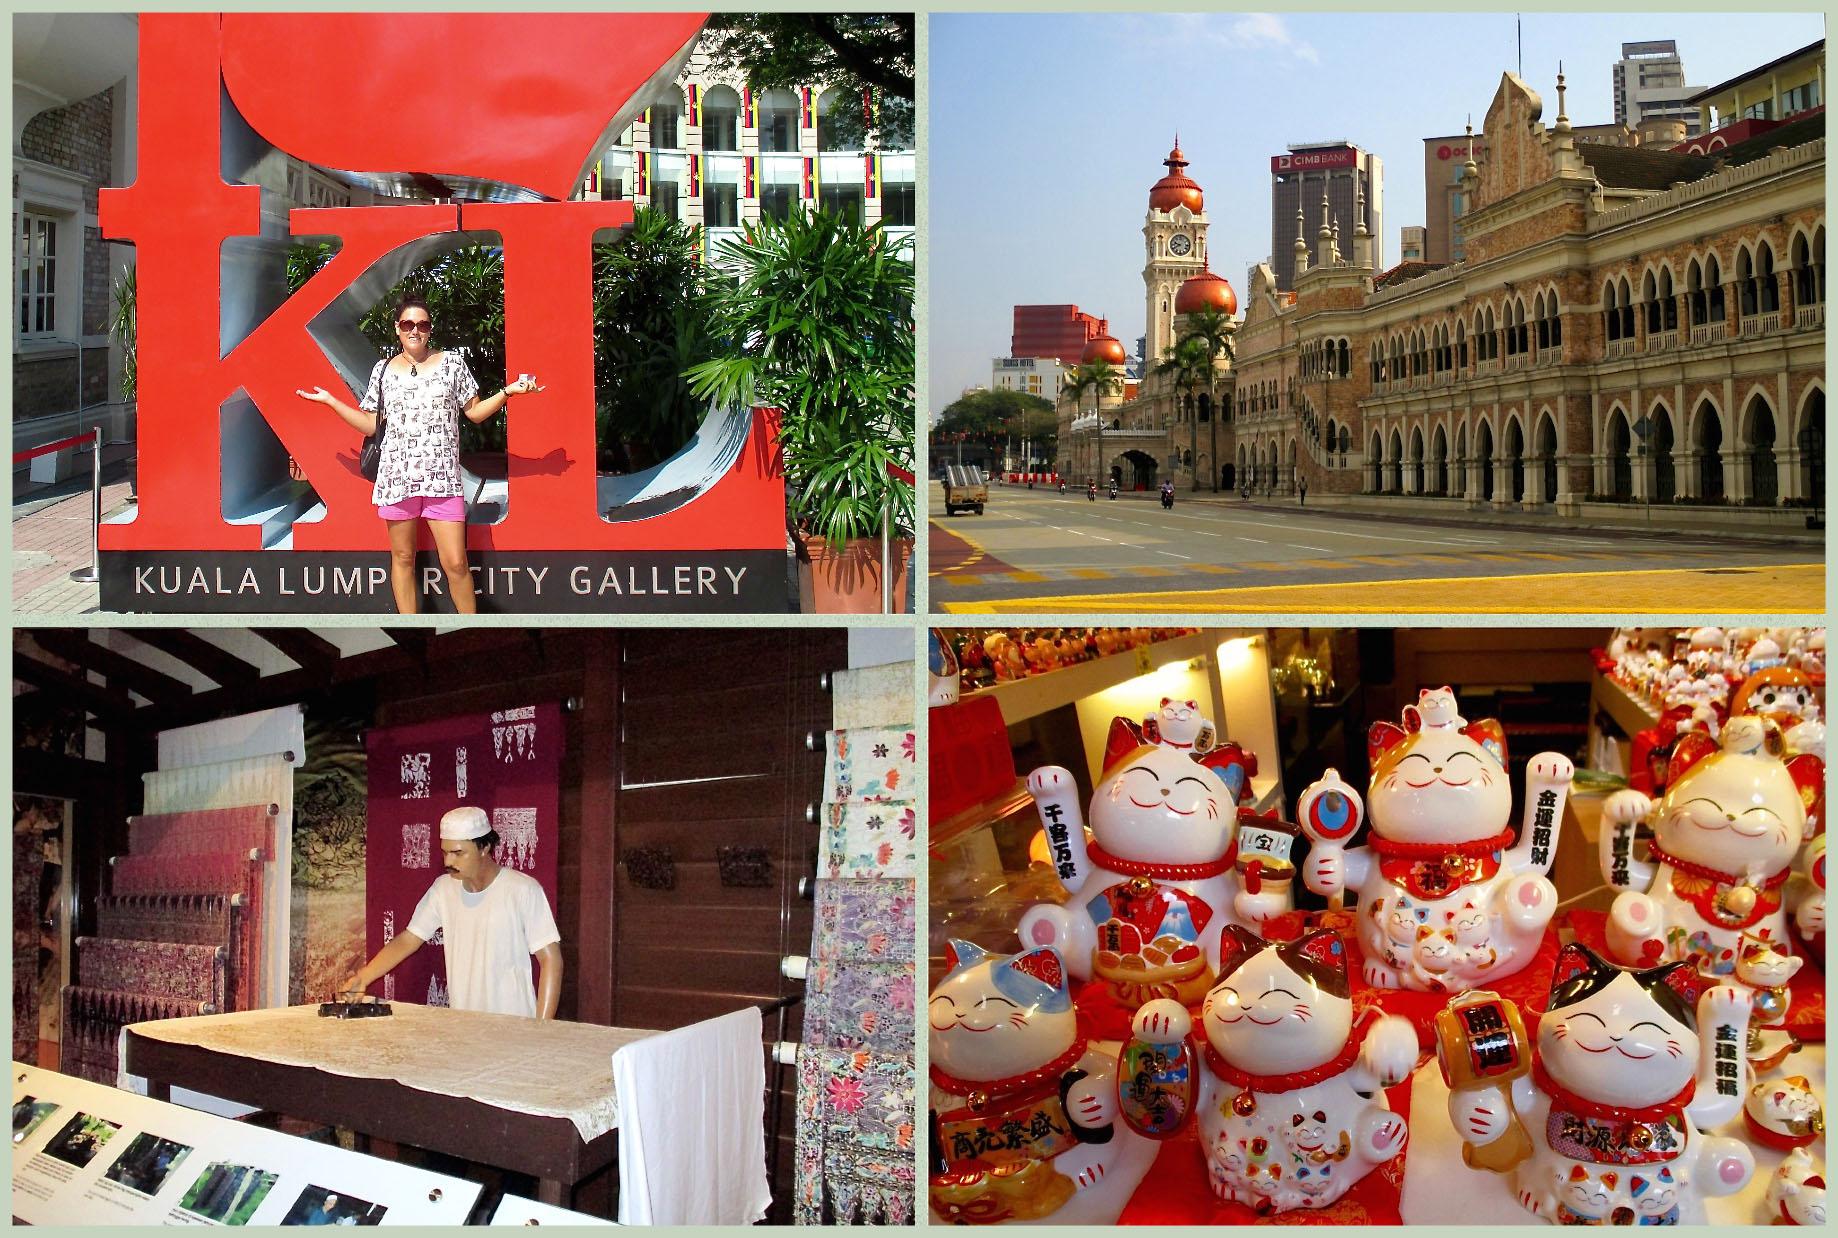 17 Free Things To Do In Kuala Lumpur